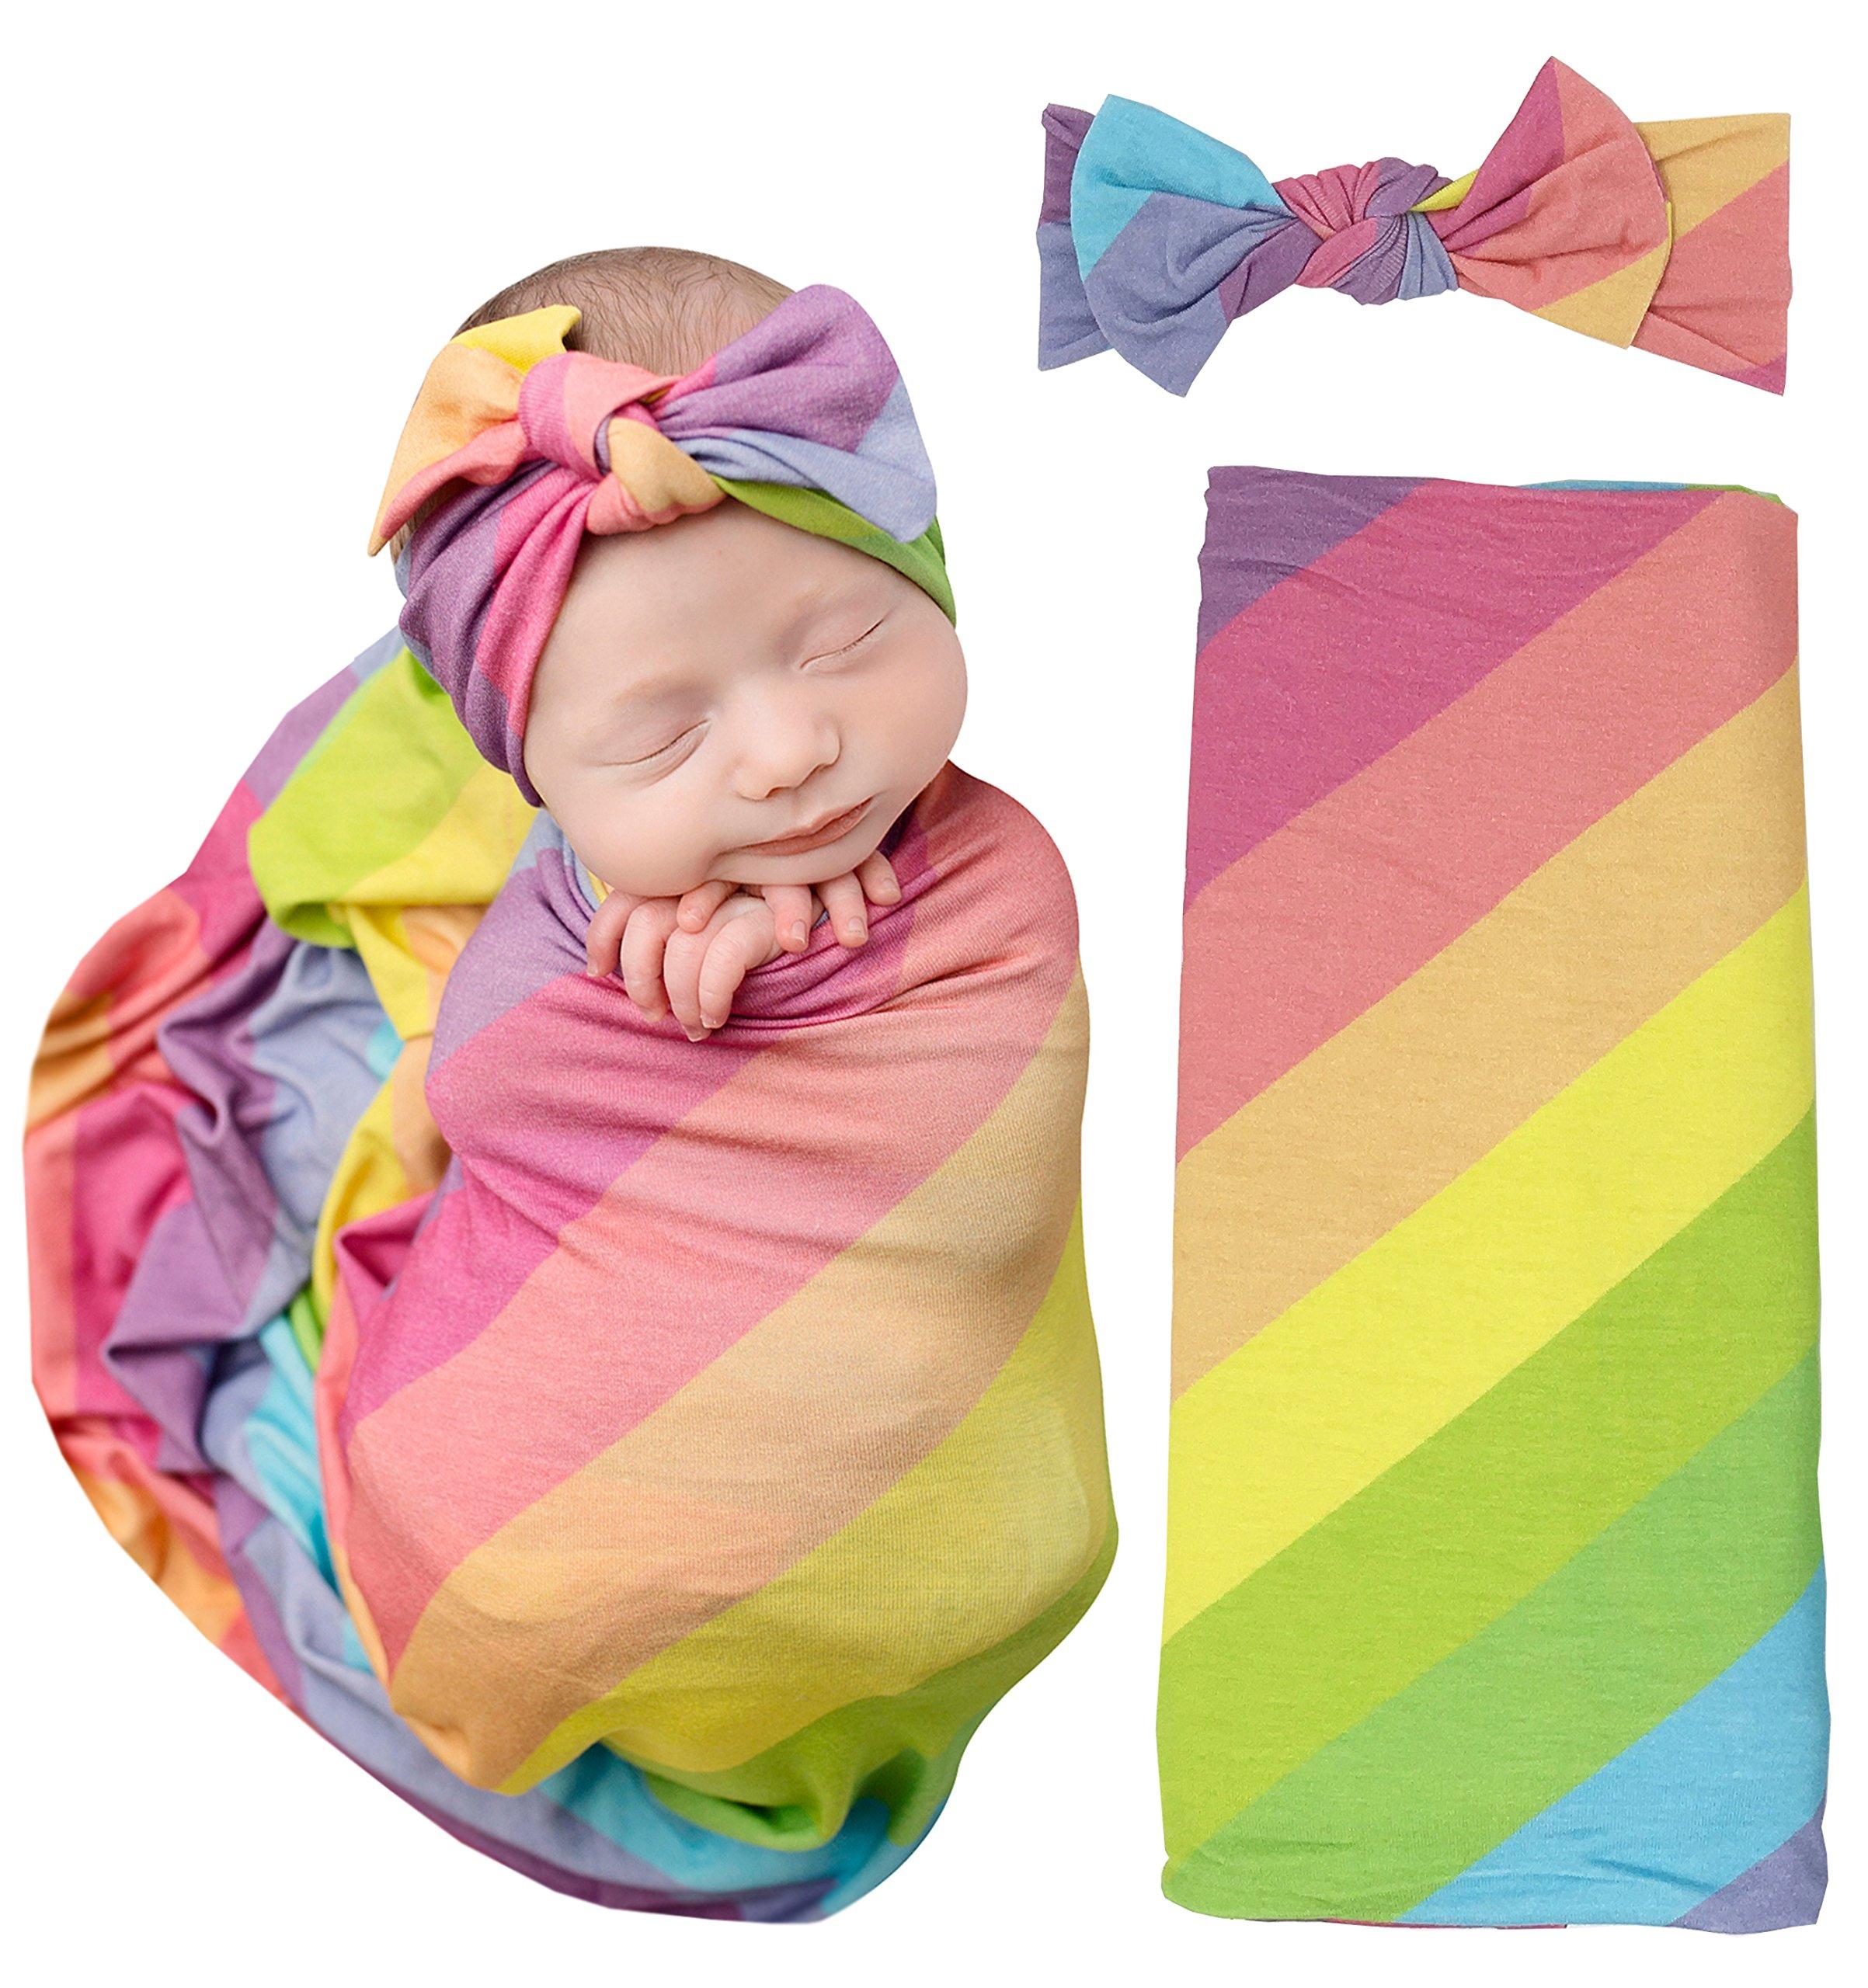 PoshPeanut Baby Swaddle Rainbow Blanket - Large Premium Knit Baby Swaddling Receiving Blanket And Headband Set, Baby Shower Newborn Gift (Magical) (Rainbow Stripes)